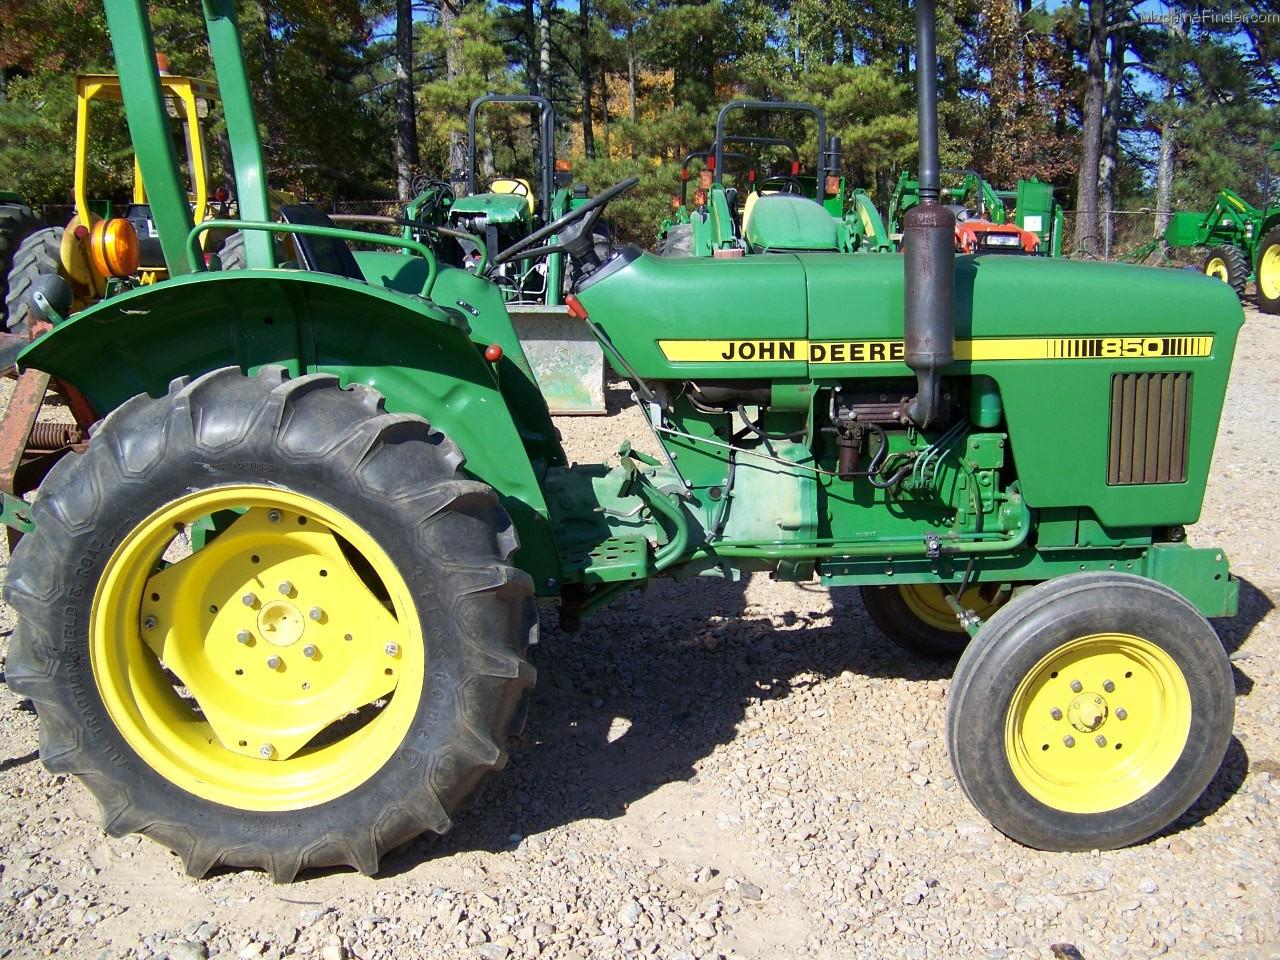 John Deere 850 Parts : Machinefinder my news faq help financing